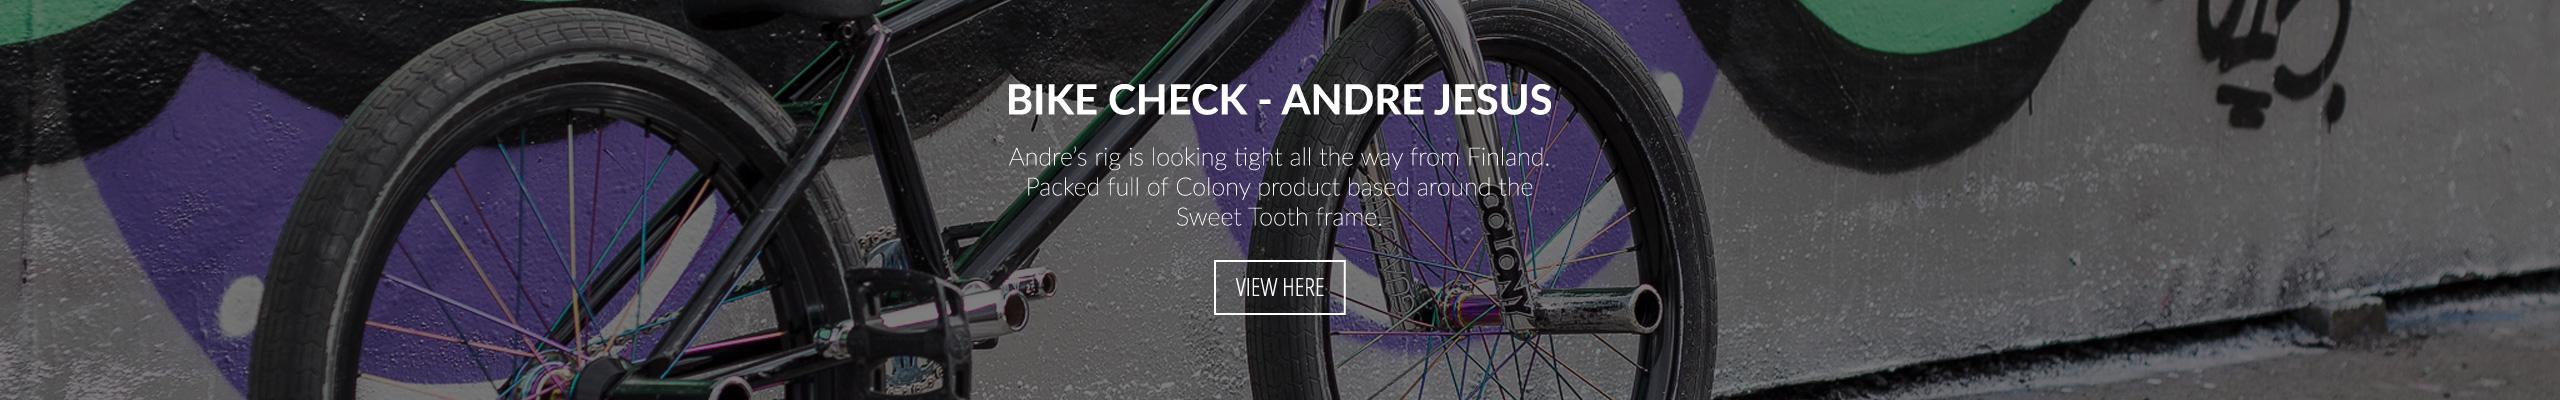 Bike Check - Andre Jesus